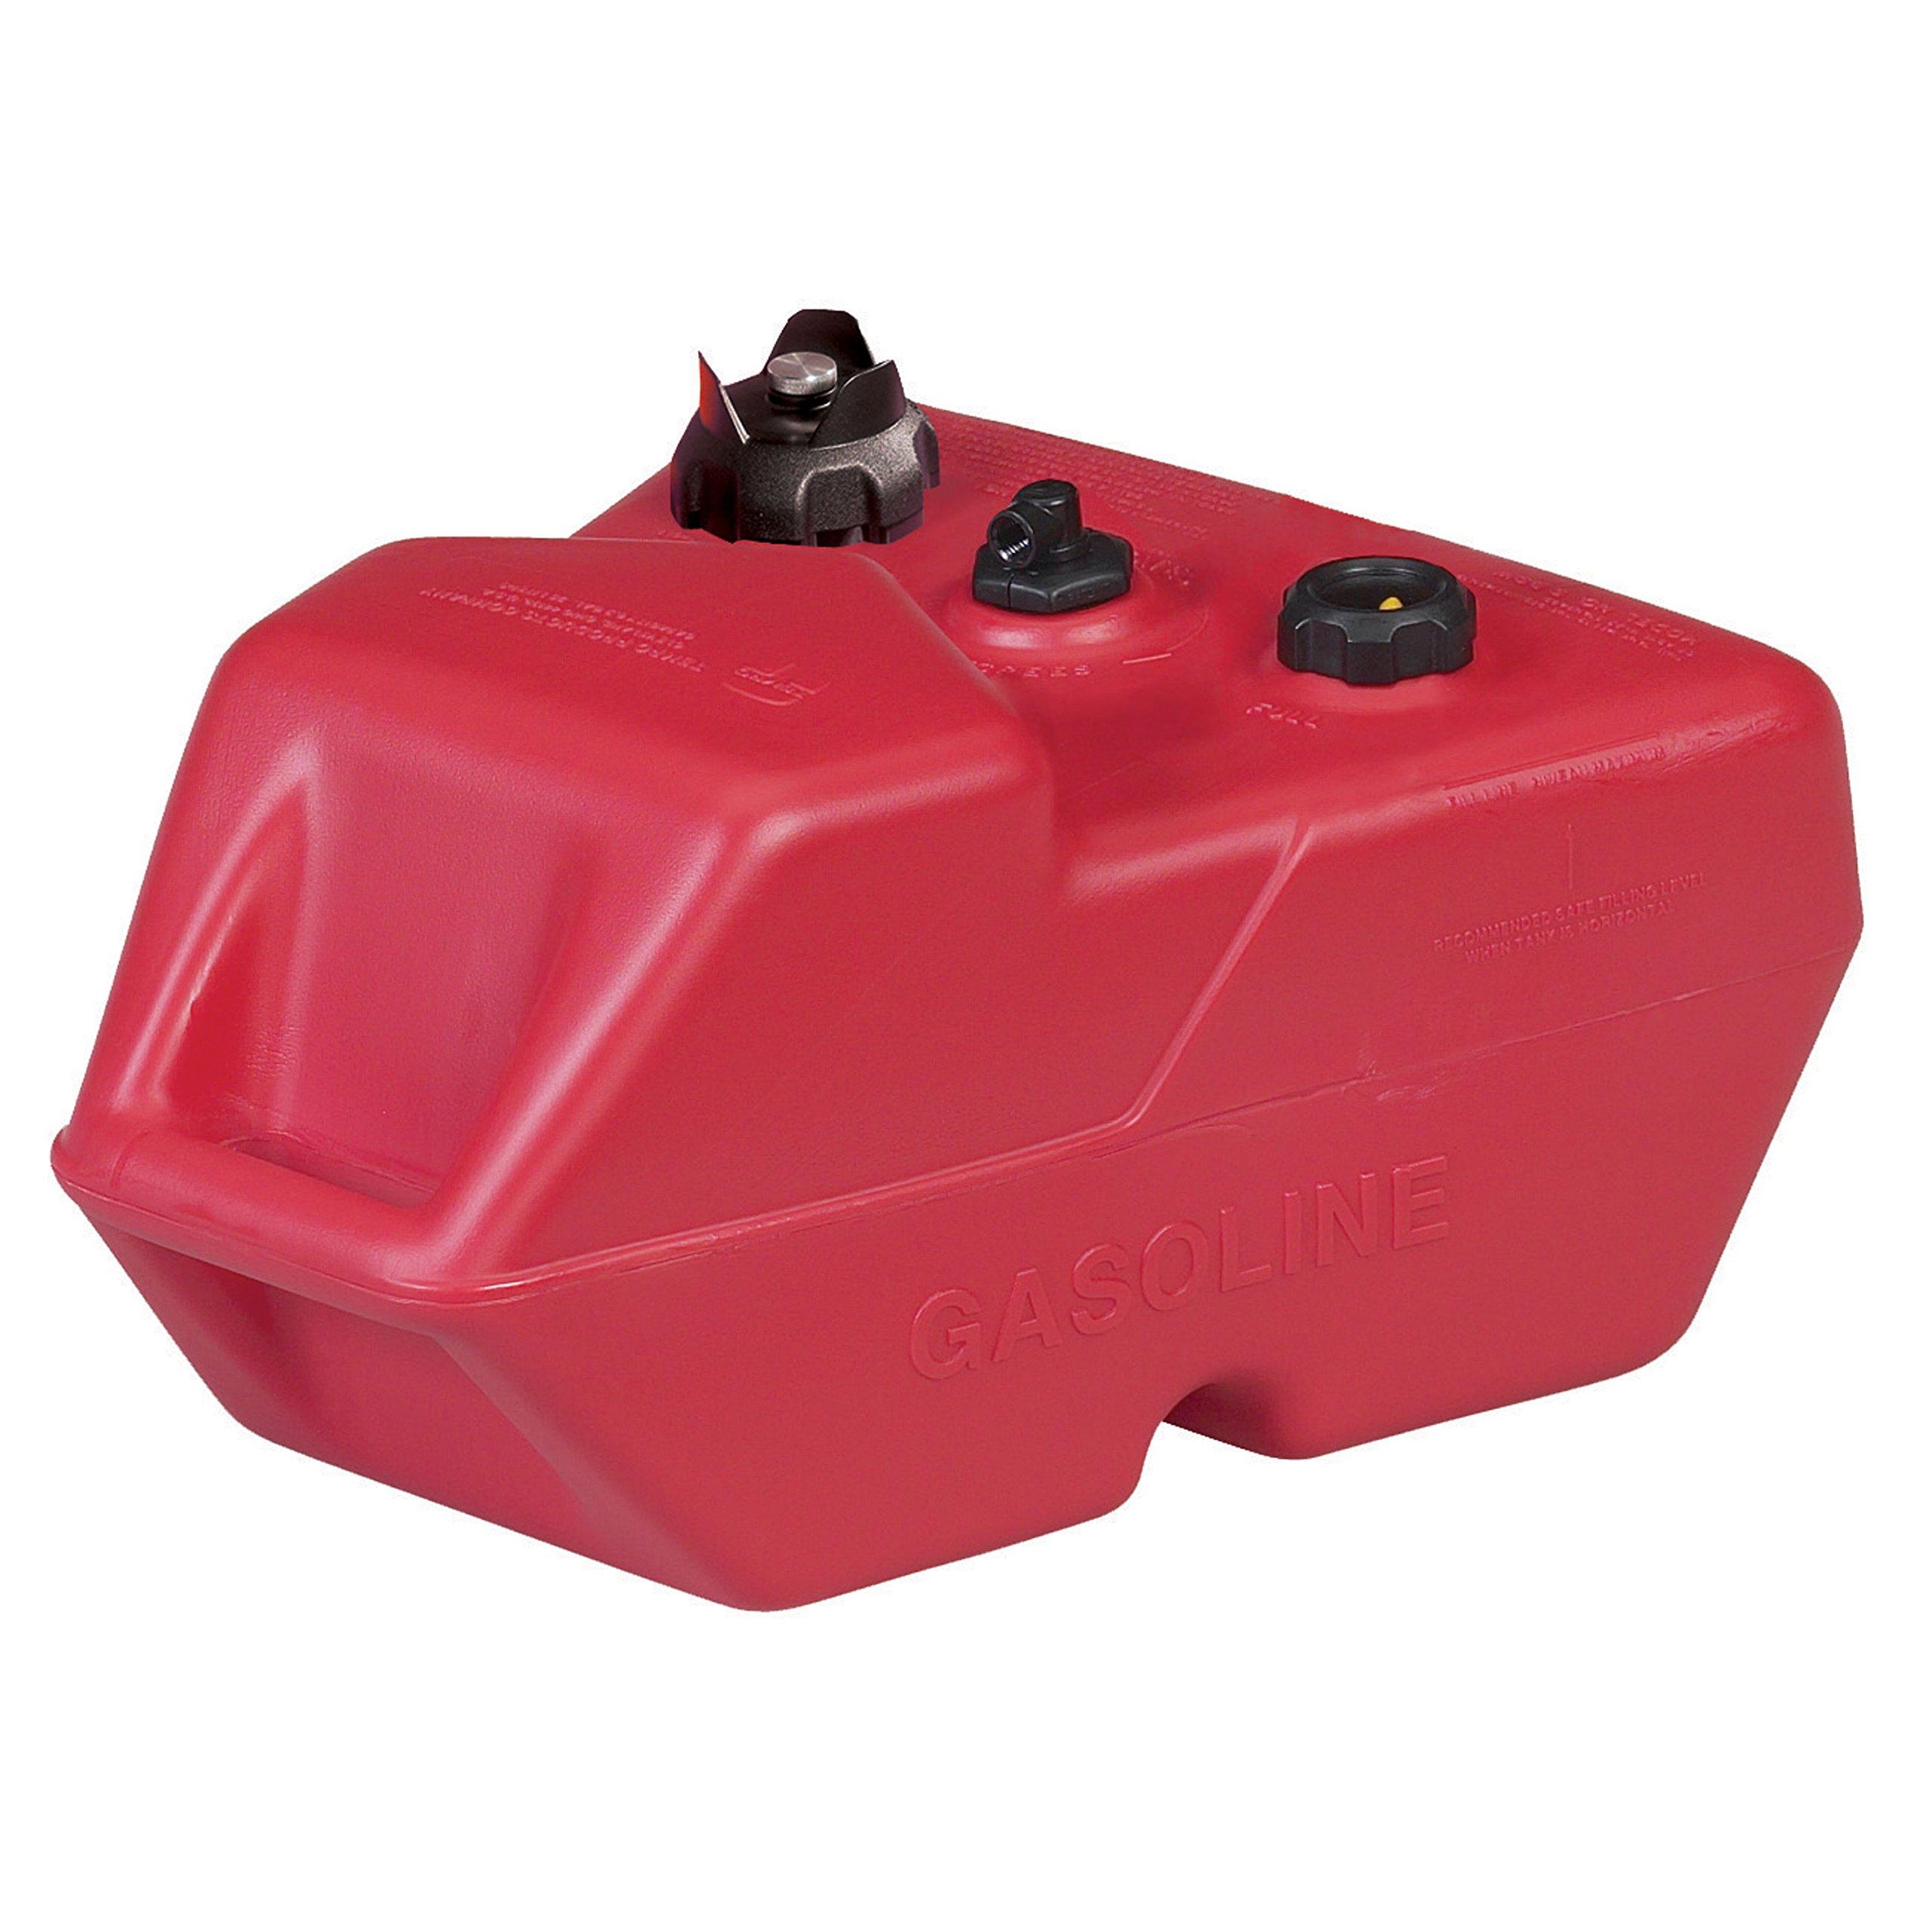 Moeller 620040LP 6BOW Portable Fuel Tank - 6 Gallon by Moeller (Image #1)